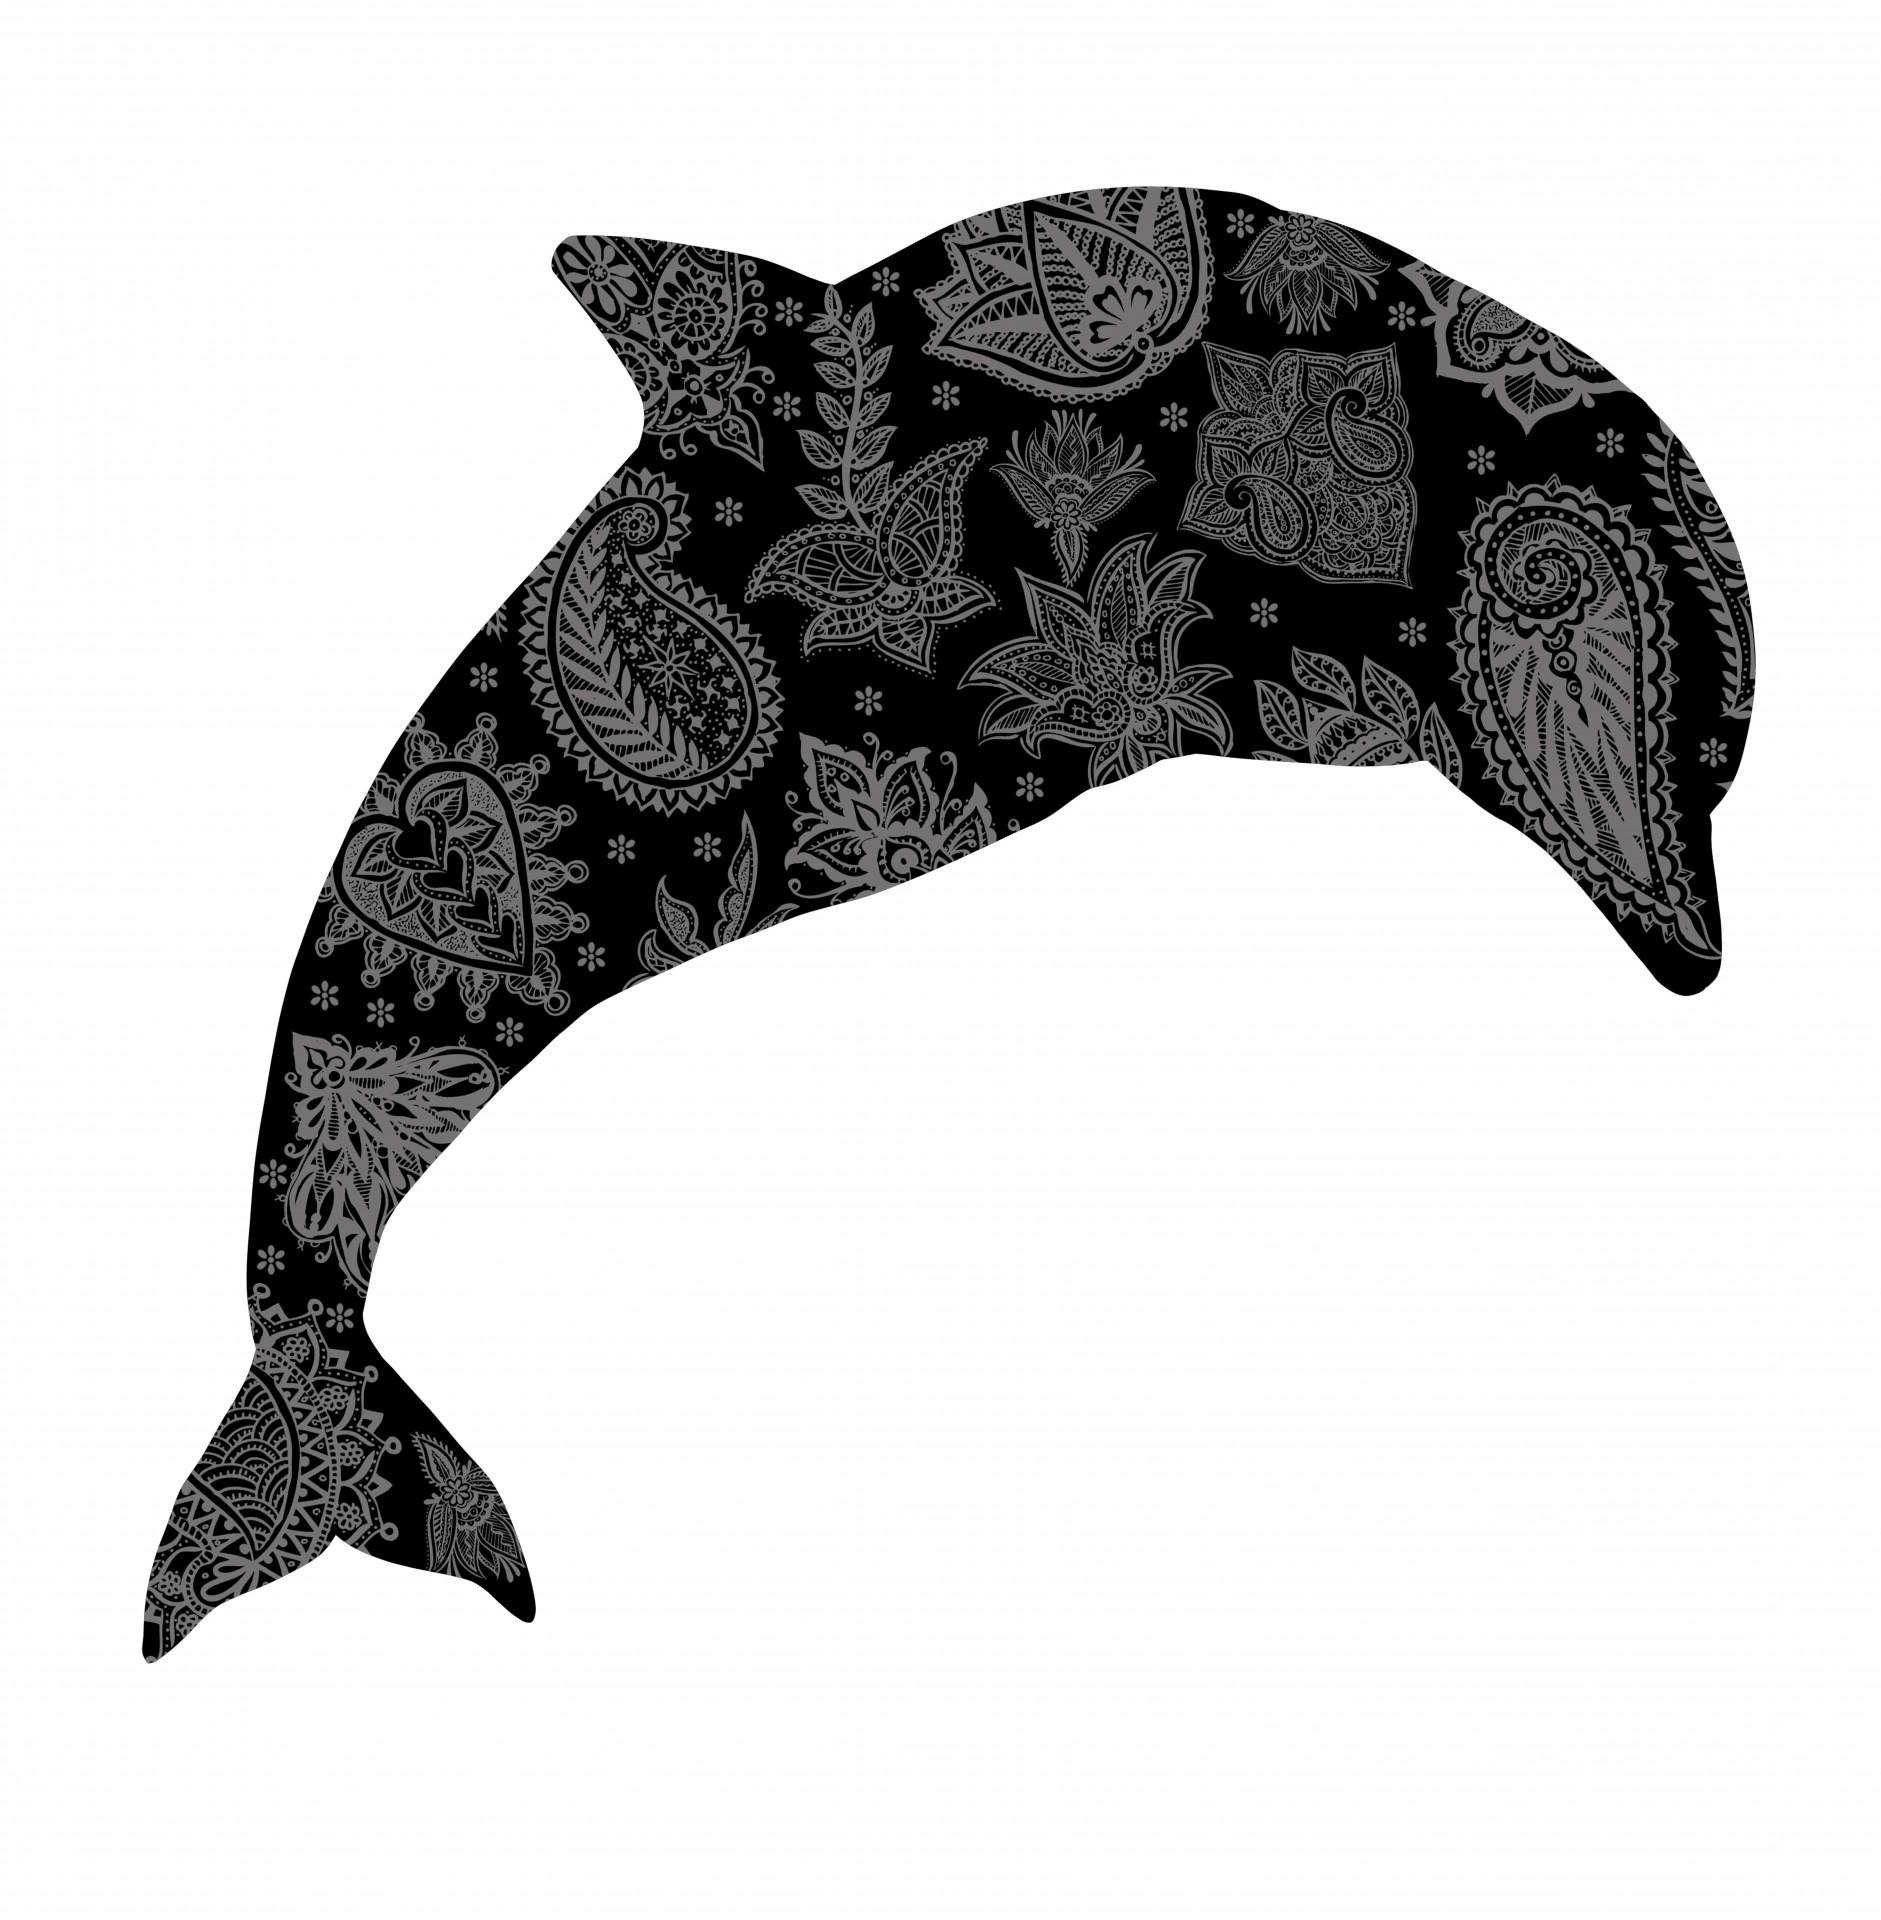 1881x1920 Dolphinampnbsphennaampnbspmehndiampnbsppattern,mehndi,henna,pattern